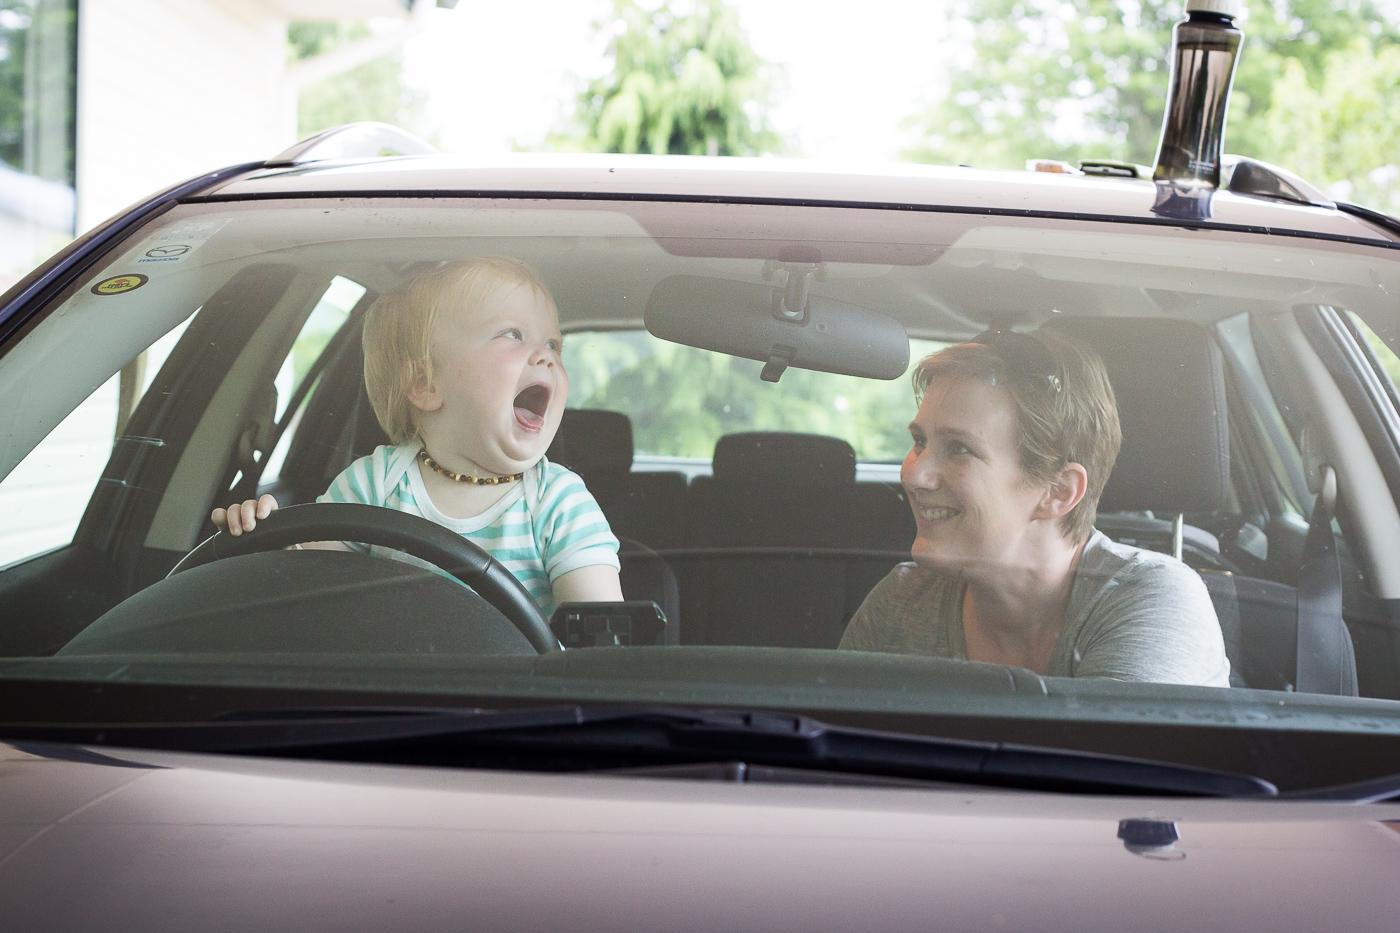 Alayna's turn to drive